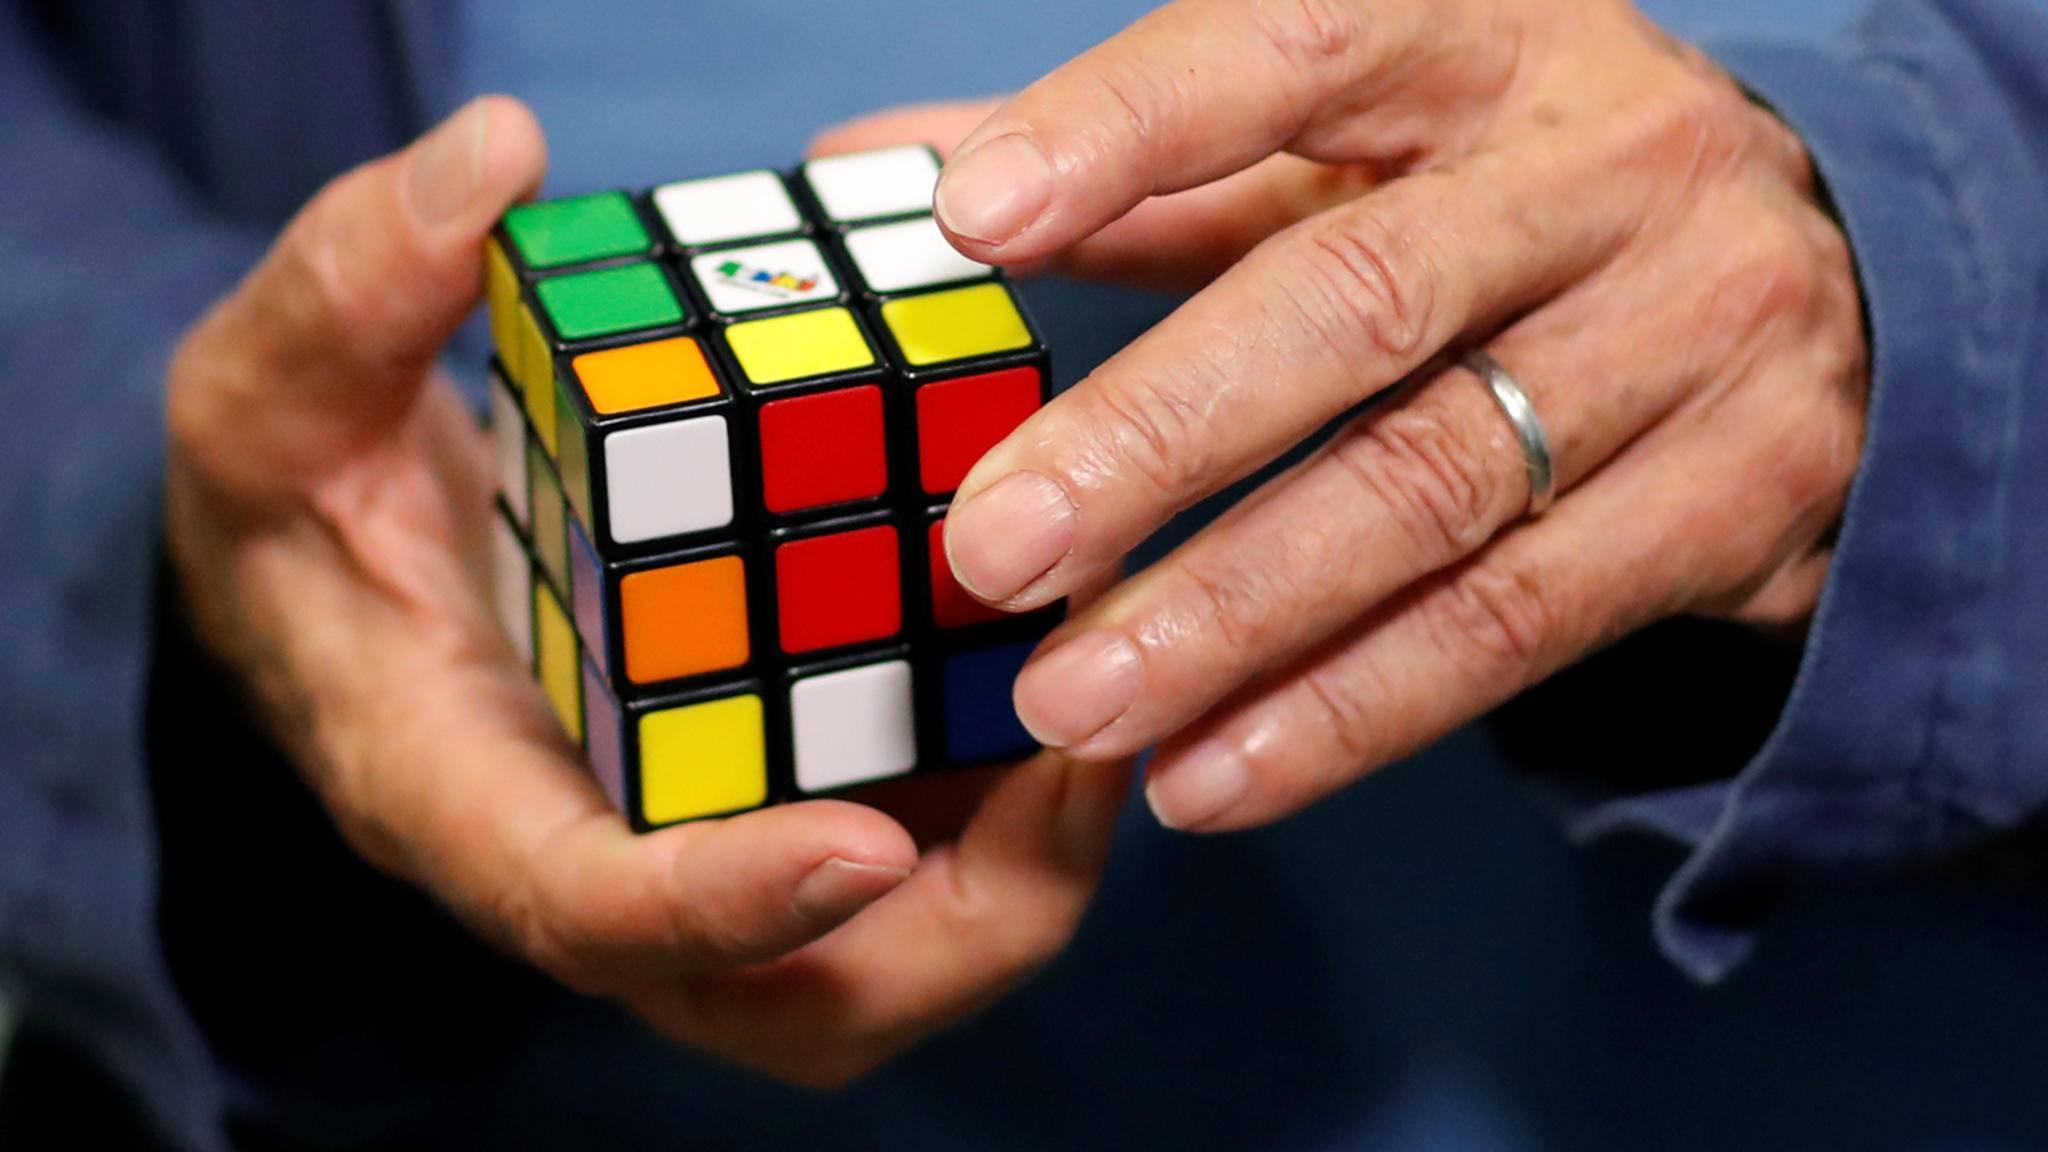 Erno Rubik mit Rubik's Cube